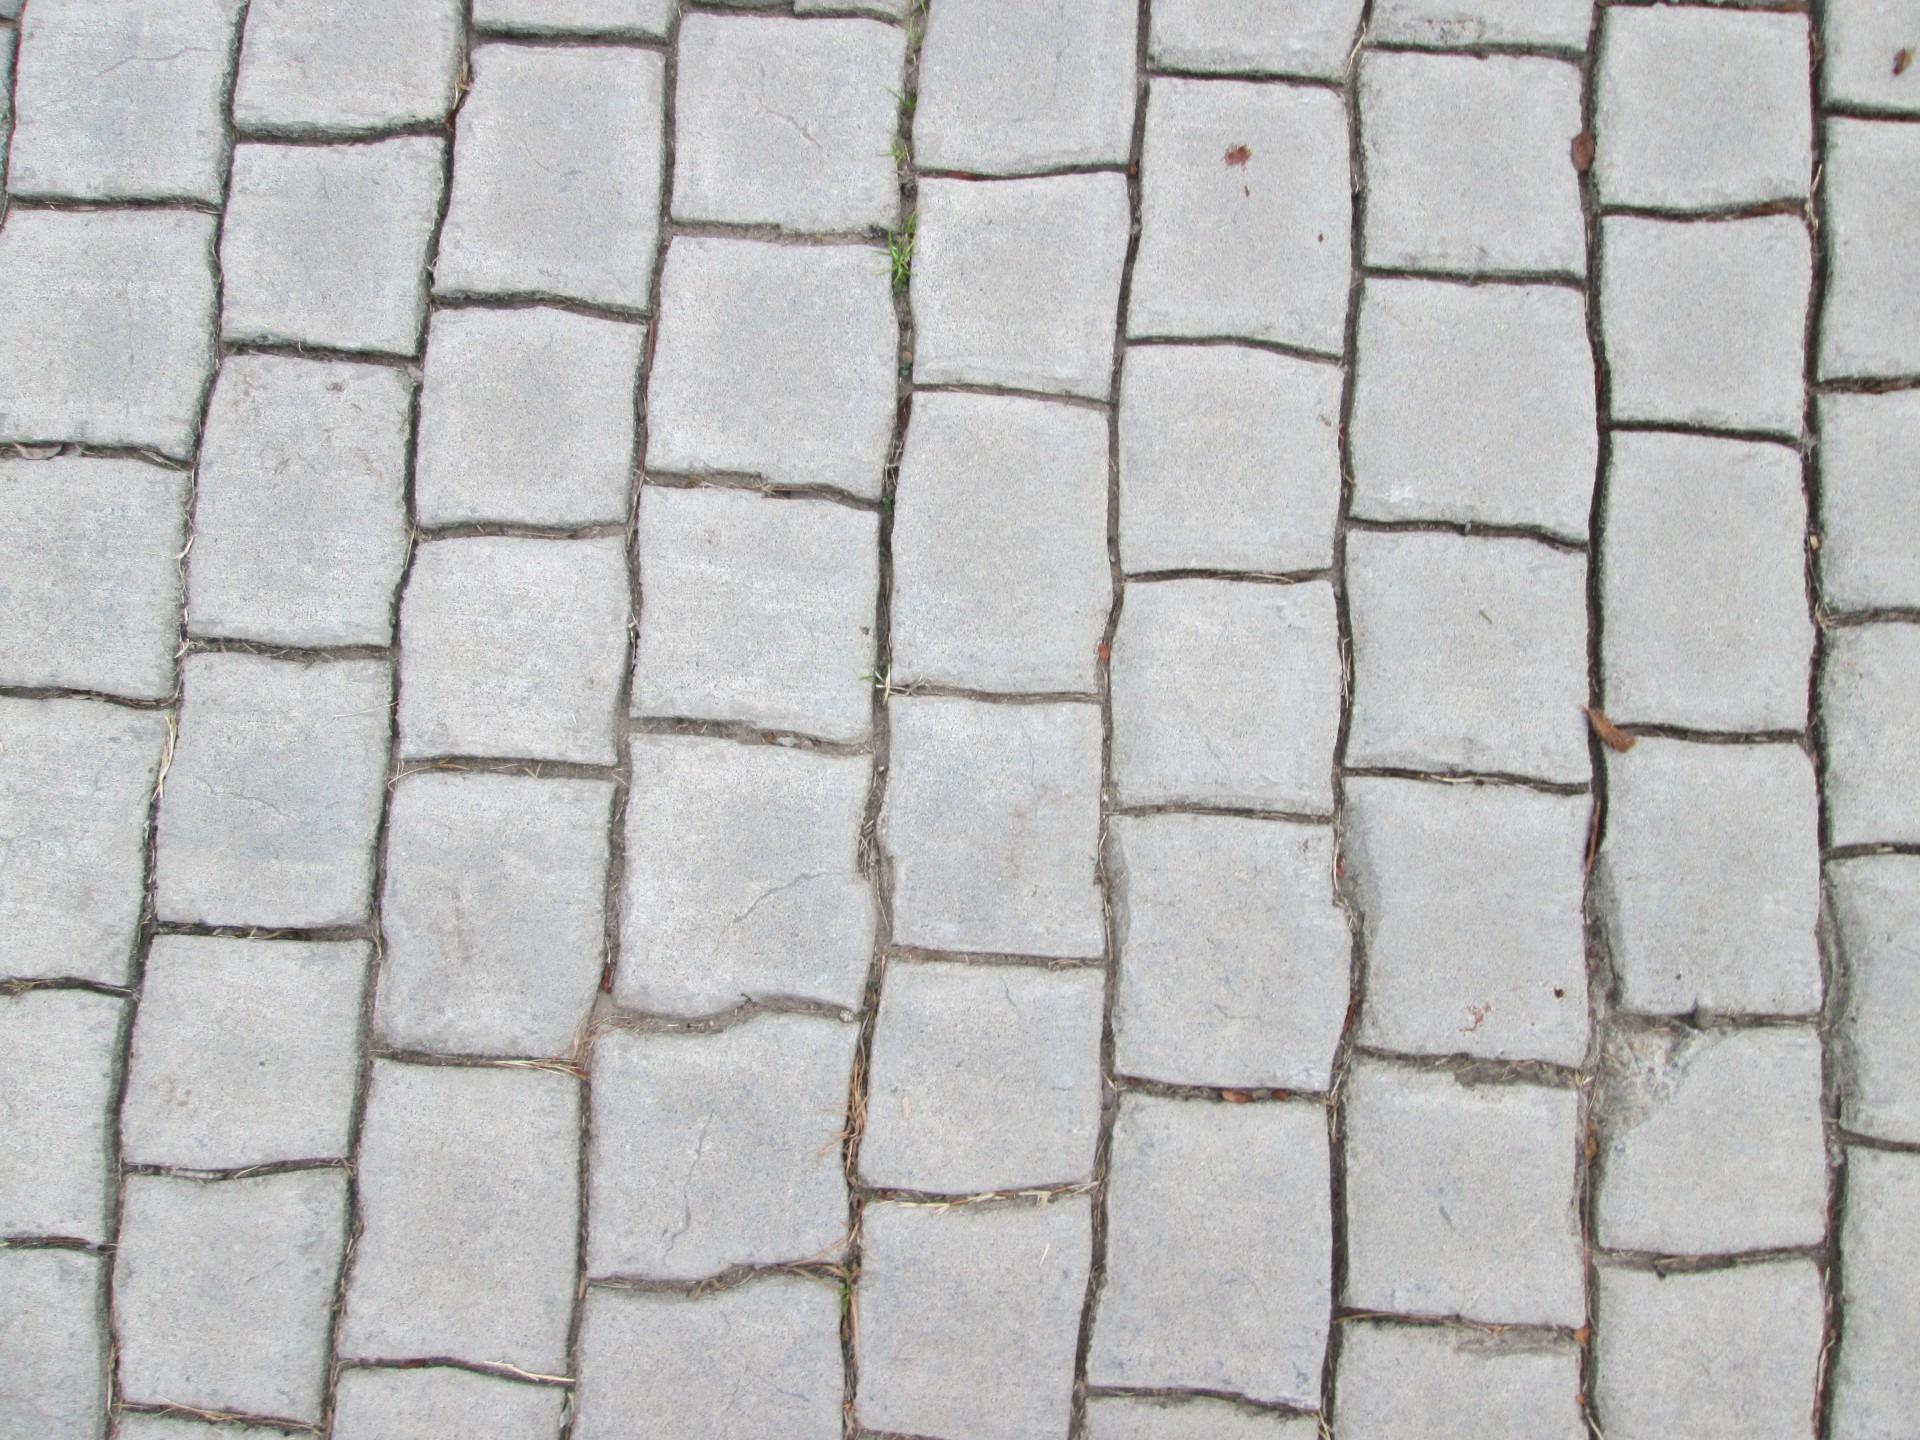 piso guijarro pared piedra asfalto construccin patrn azulejo spero pared de piedra ladrillo bloquear art fondo